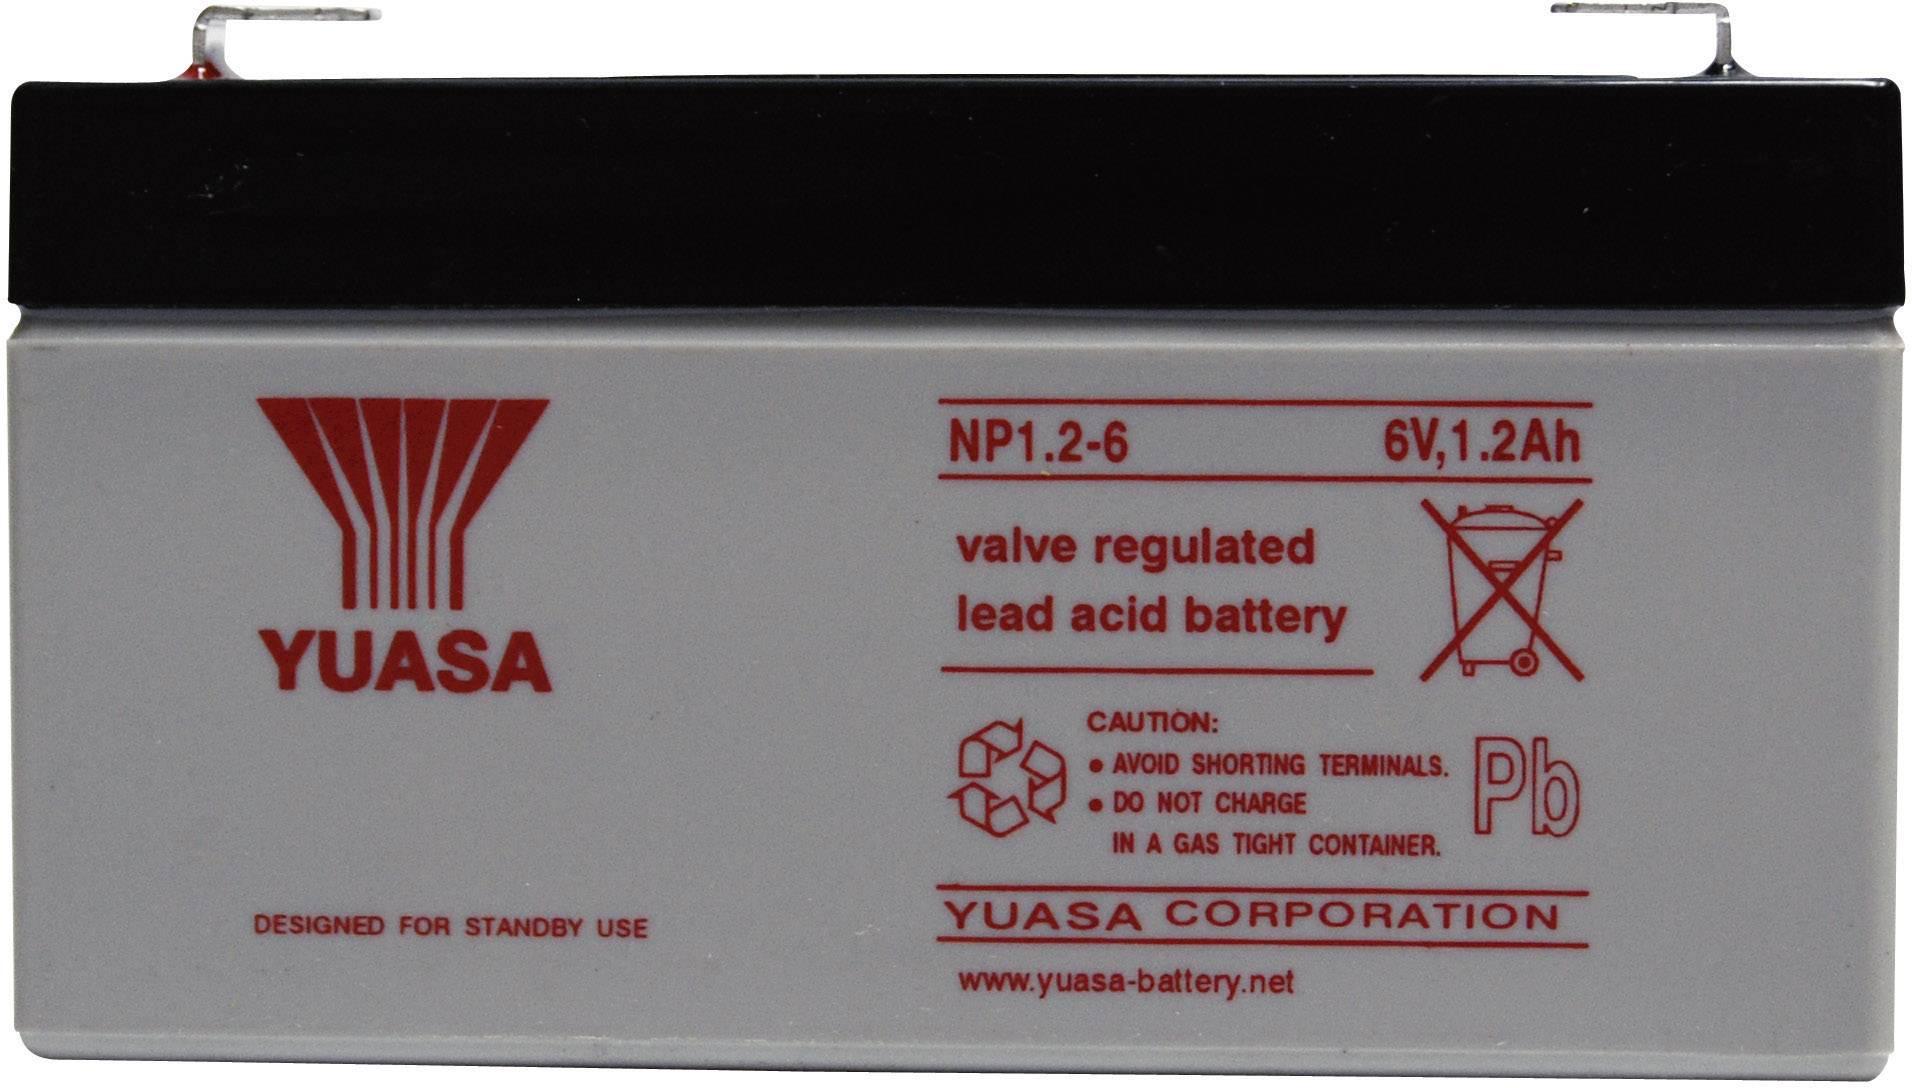 Yuasa NP1.2-6 NP1.2-6 Batteria